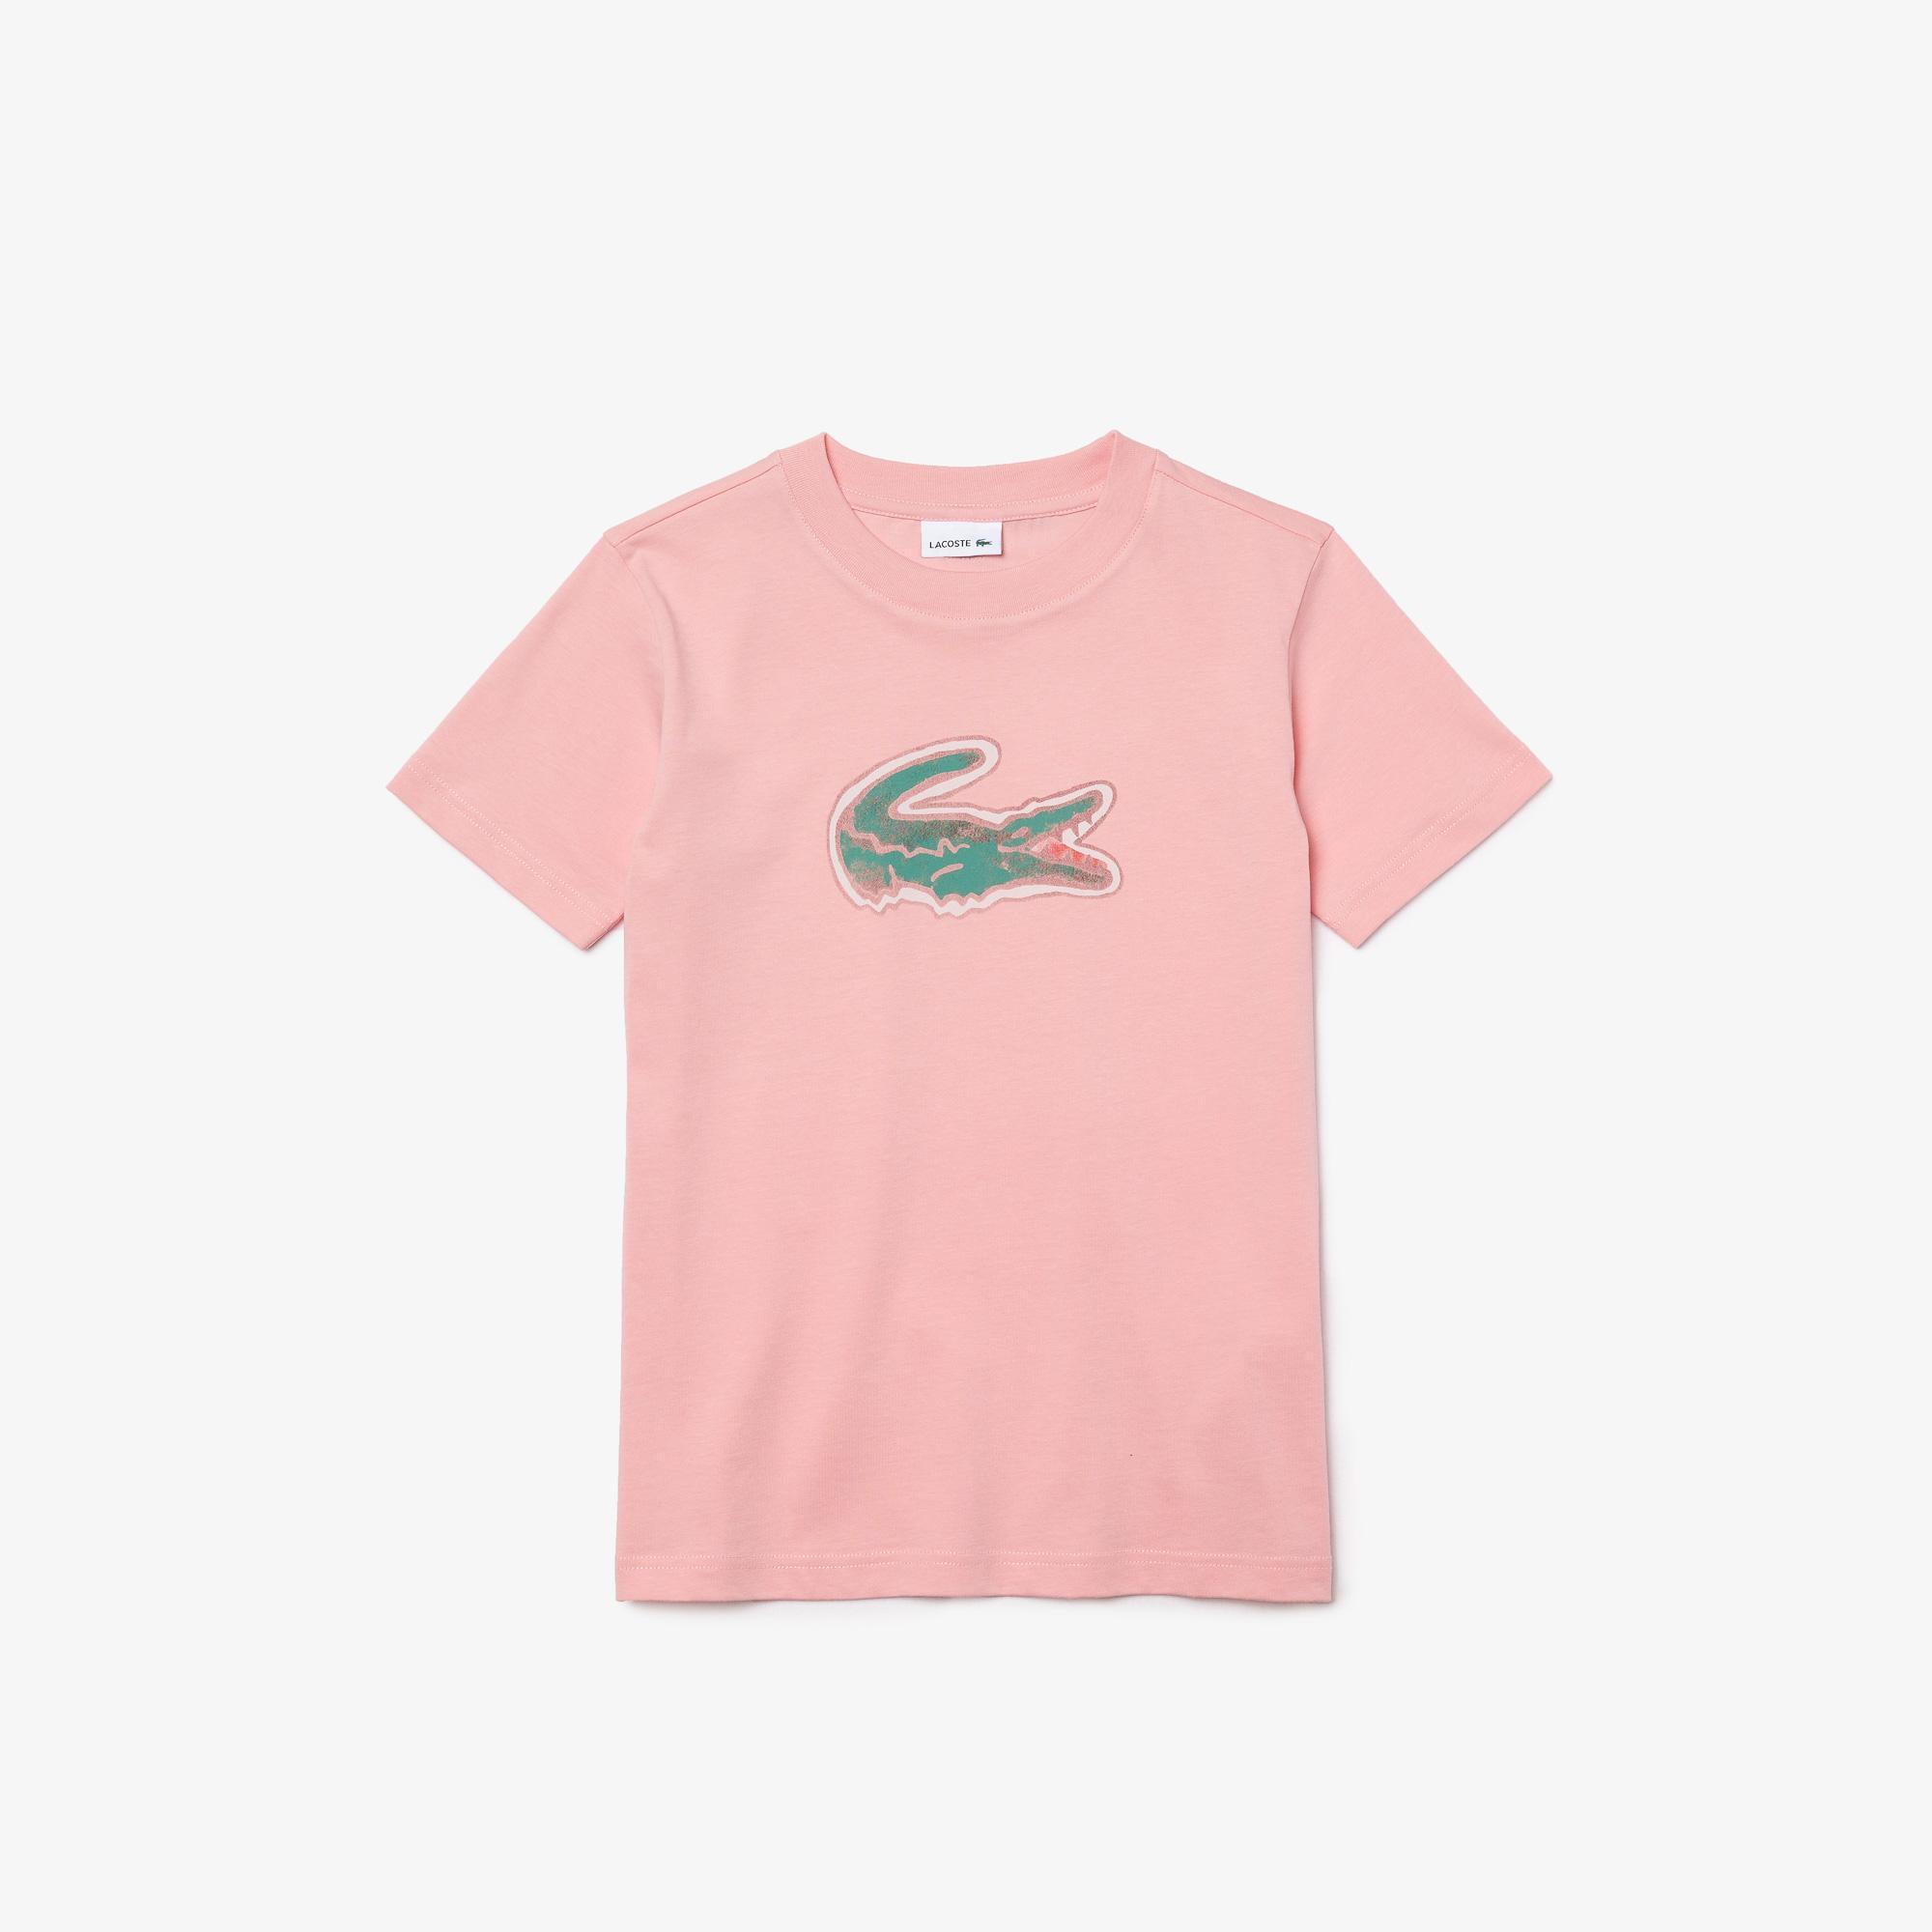 Lacoste Çocuk Bisiklet Yaka Baskılı Pembe T-Shirt